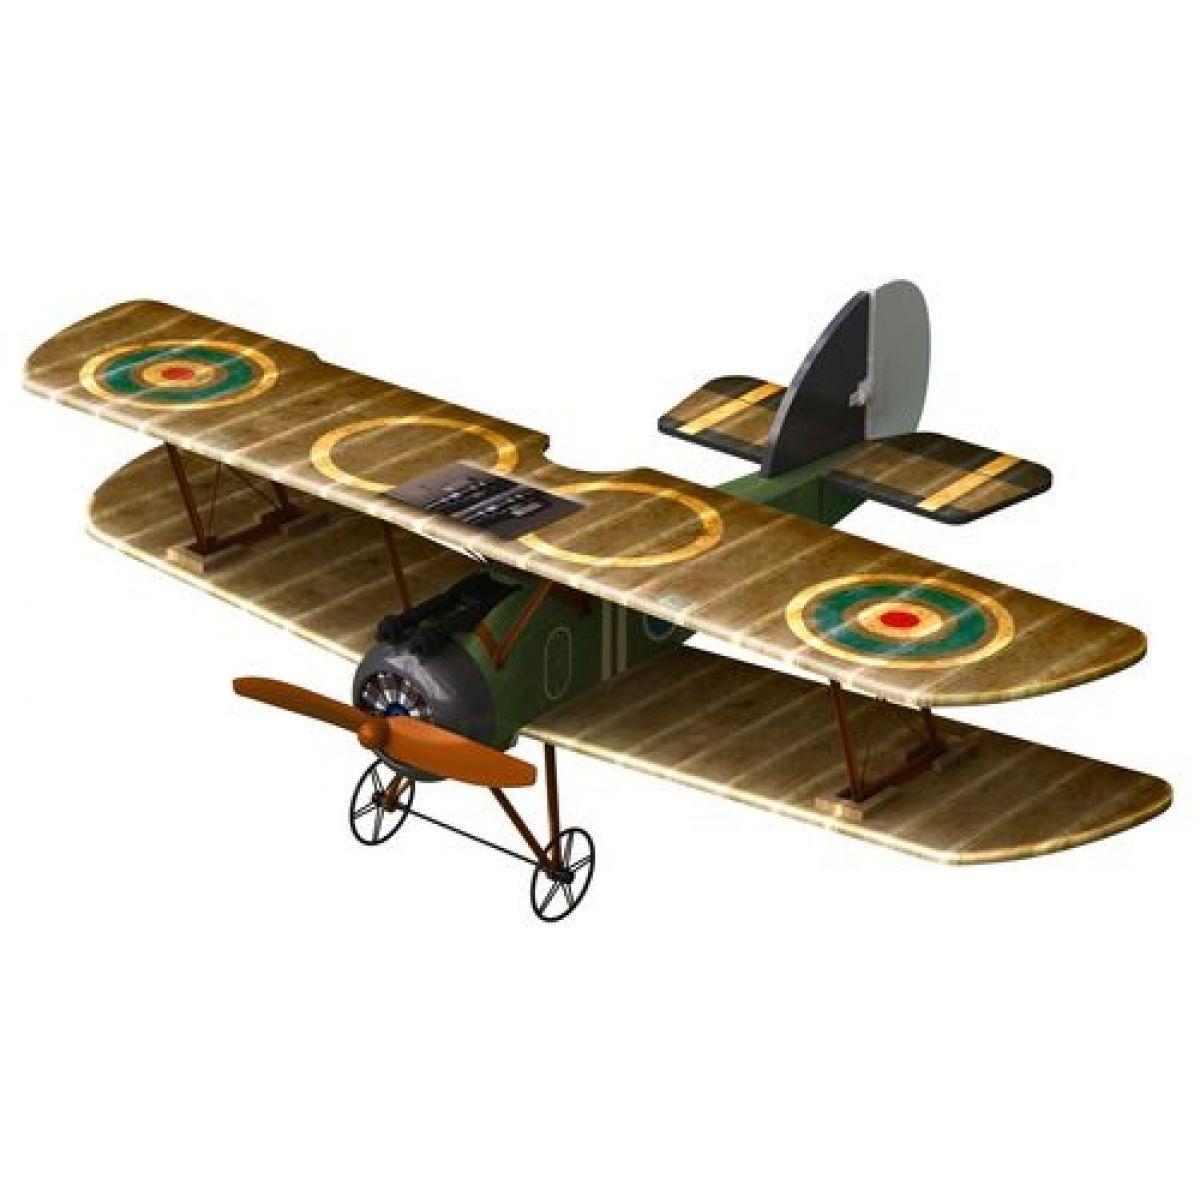 Letadlo X-Twin:R/C Sopwith Camel Silverit - Hnědá